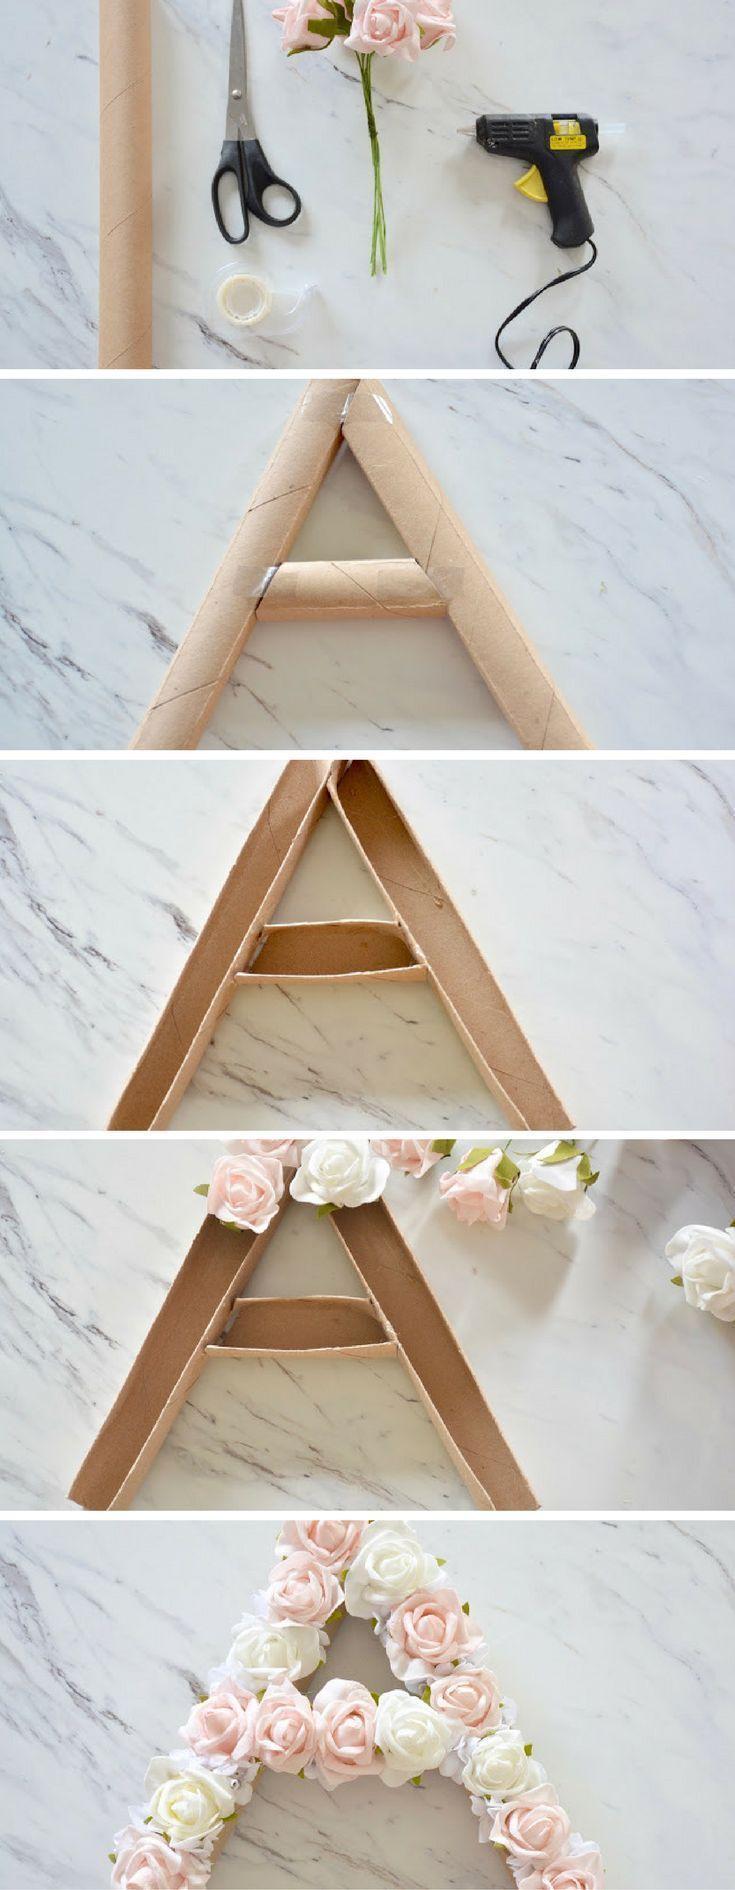 DIY floral monogram - make this fun and simple summer decor! #DIYHo ...#decor #diy #diyho #floral #fun #monogram #simple #summer